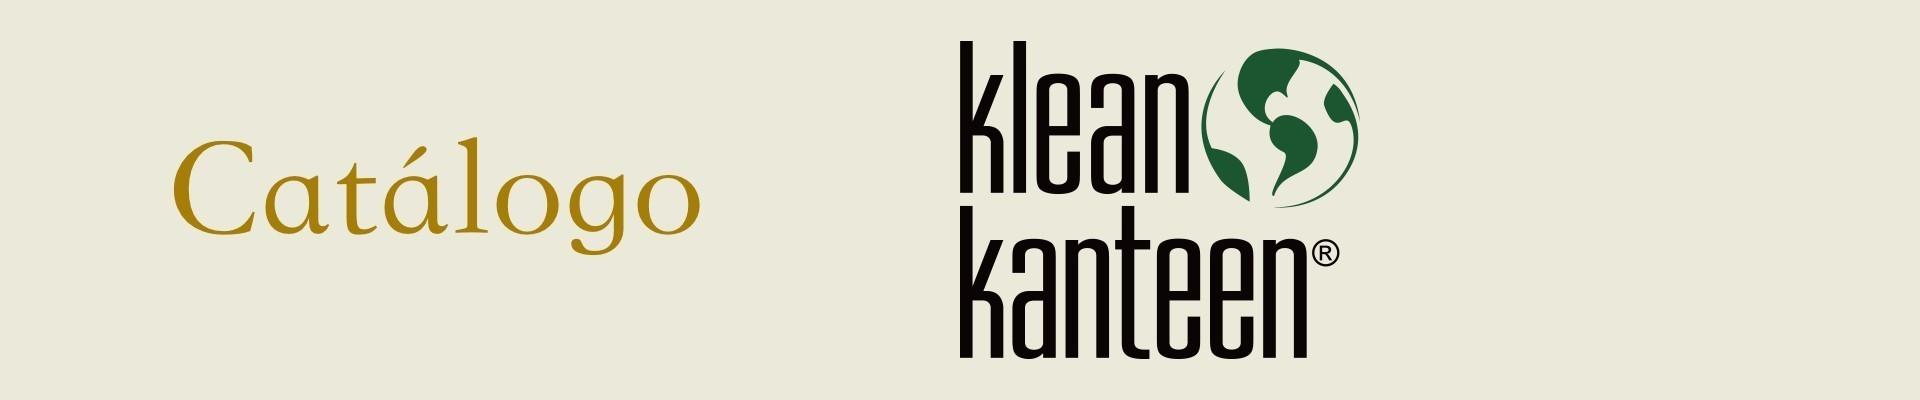 Klean Kanteen. Botellas de acero inoxidable ecológicas